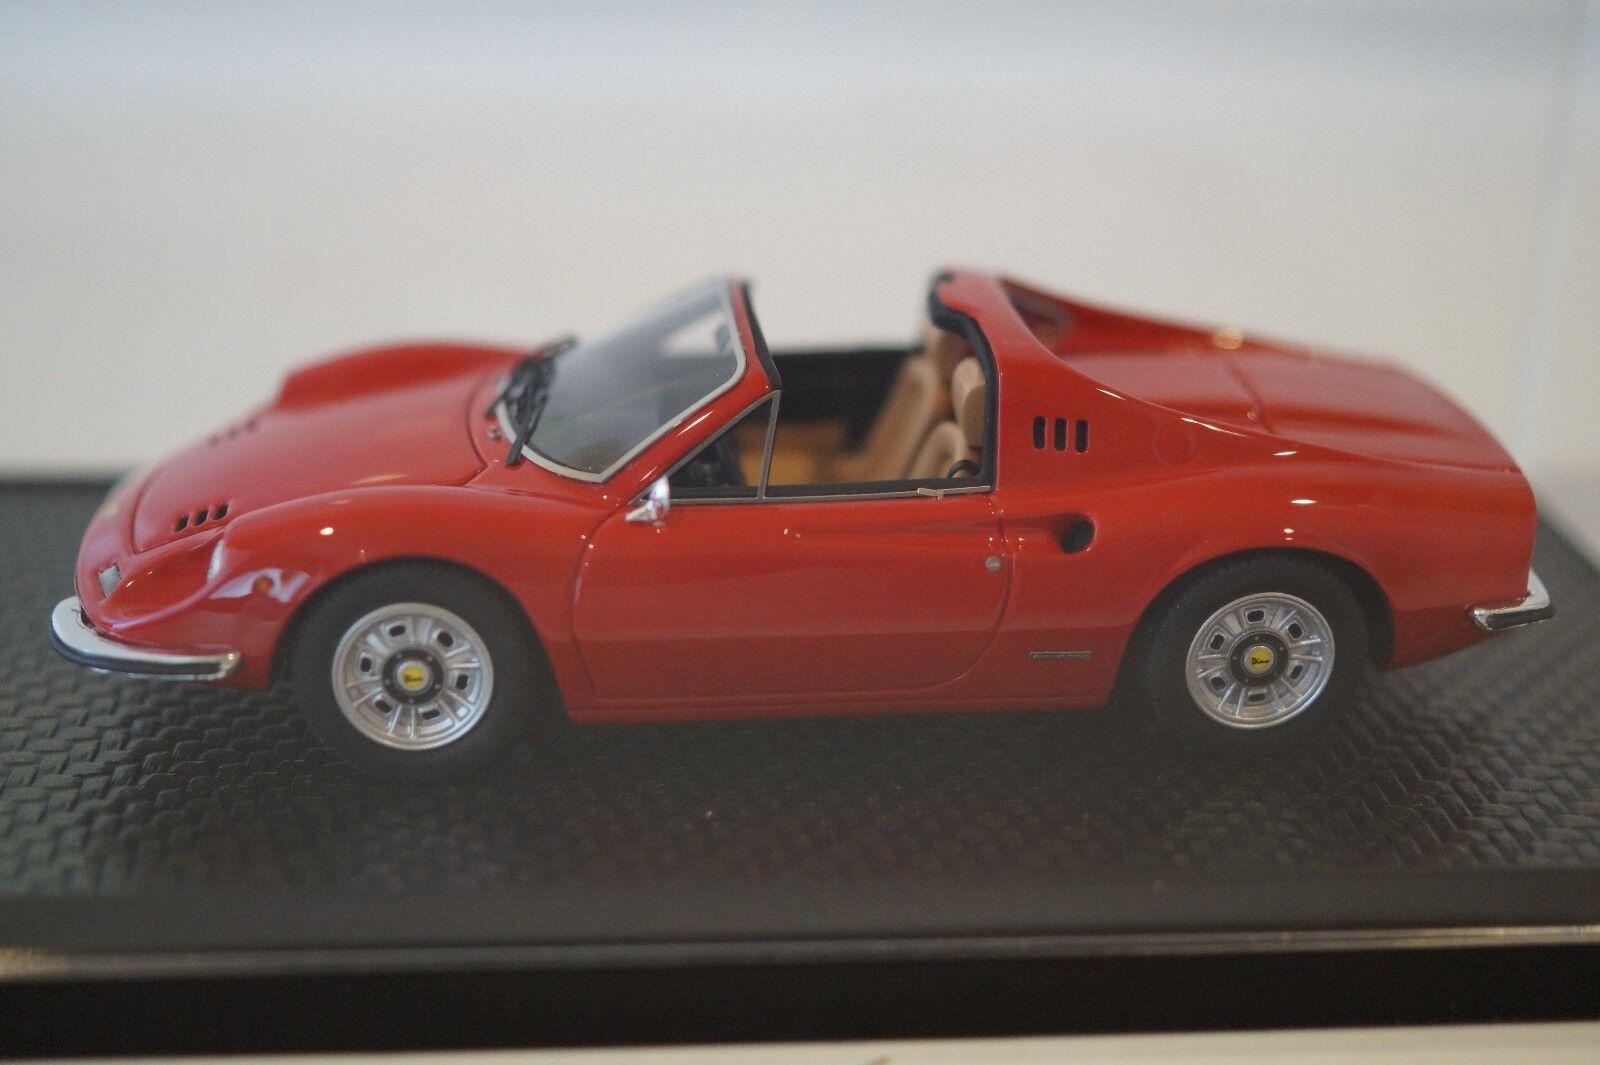 Ferrari 246 GTS Dino 1972 by BBR 1 43 red Corsa (Red)